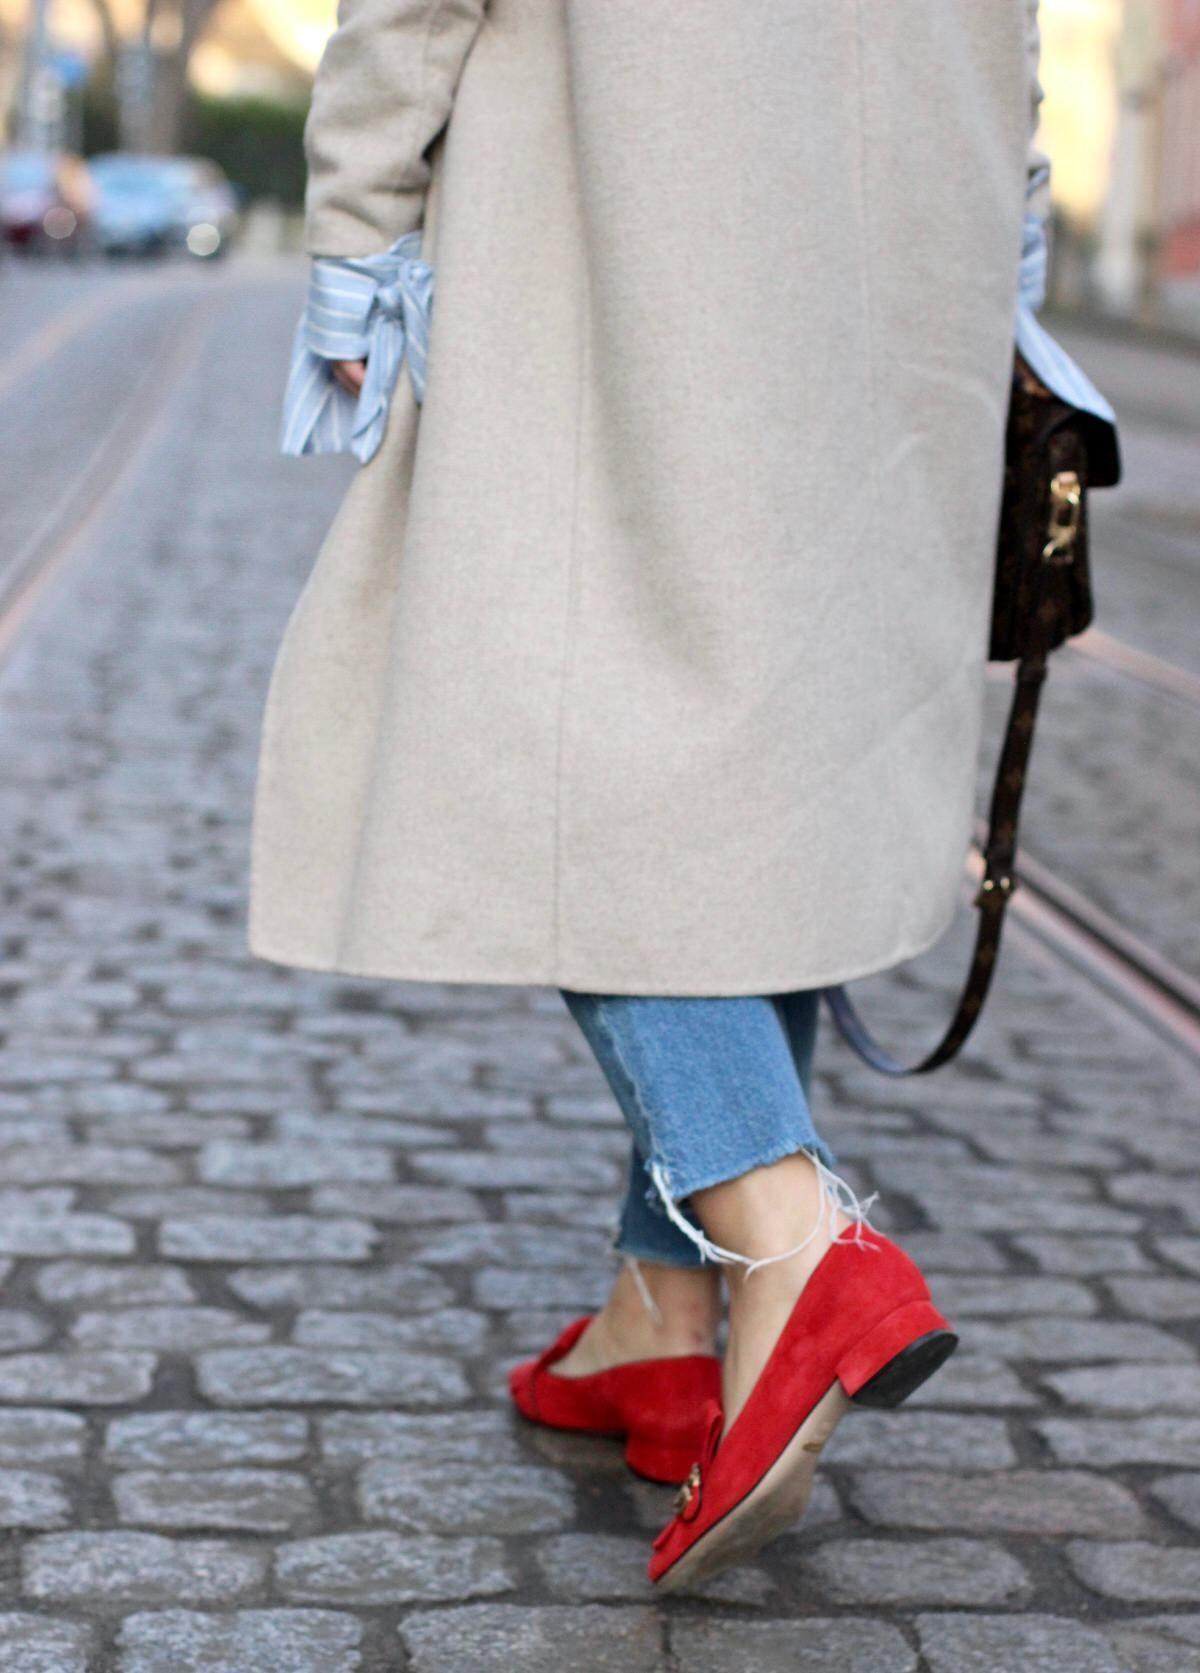 Gucci College Pumps GG Marmont, Louis Vuitton Pochette Metis, Edited, Streetstyle, Dior Sonnenbrille, Jeans abgestufter Saum, Zara